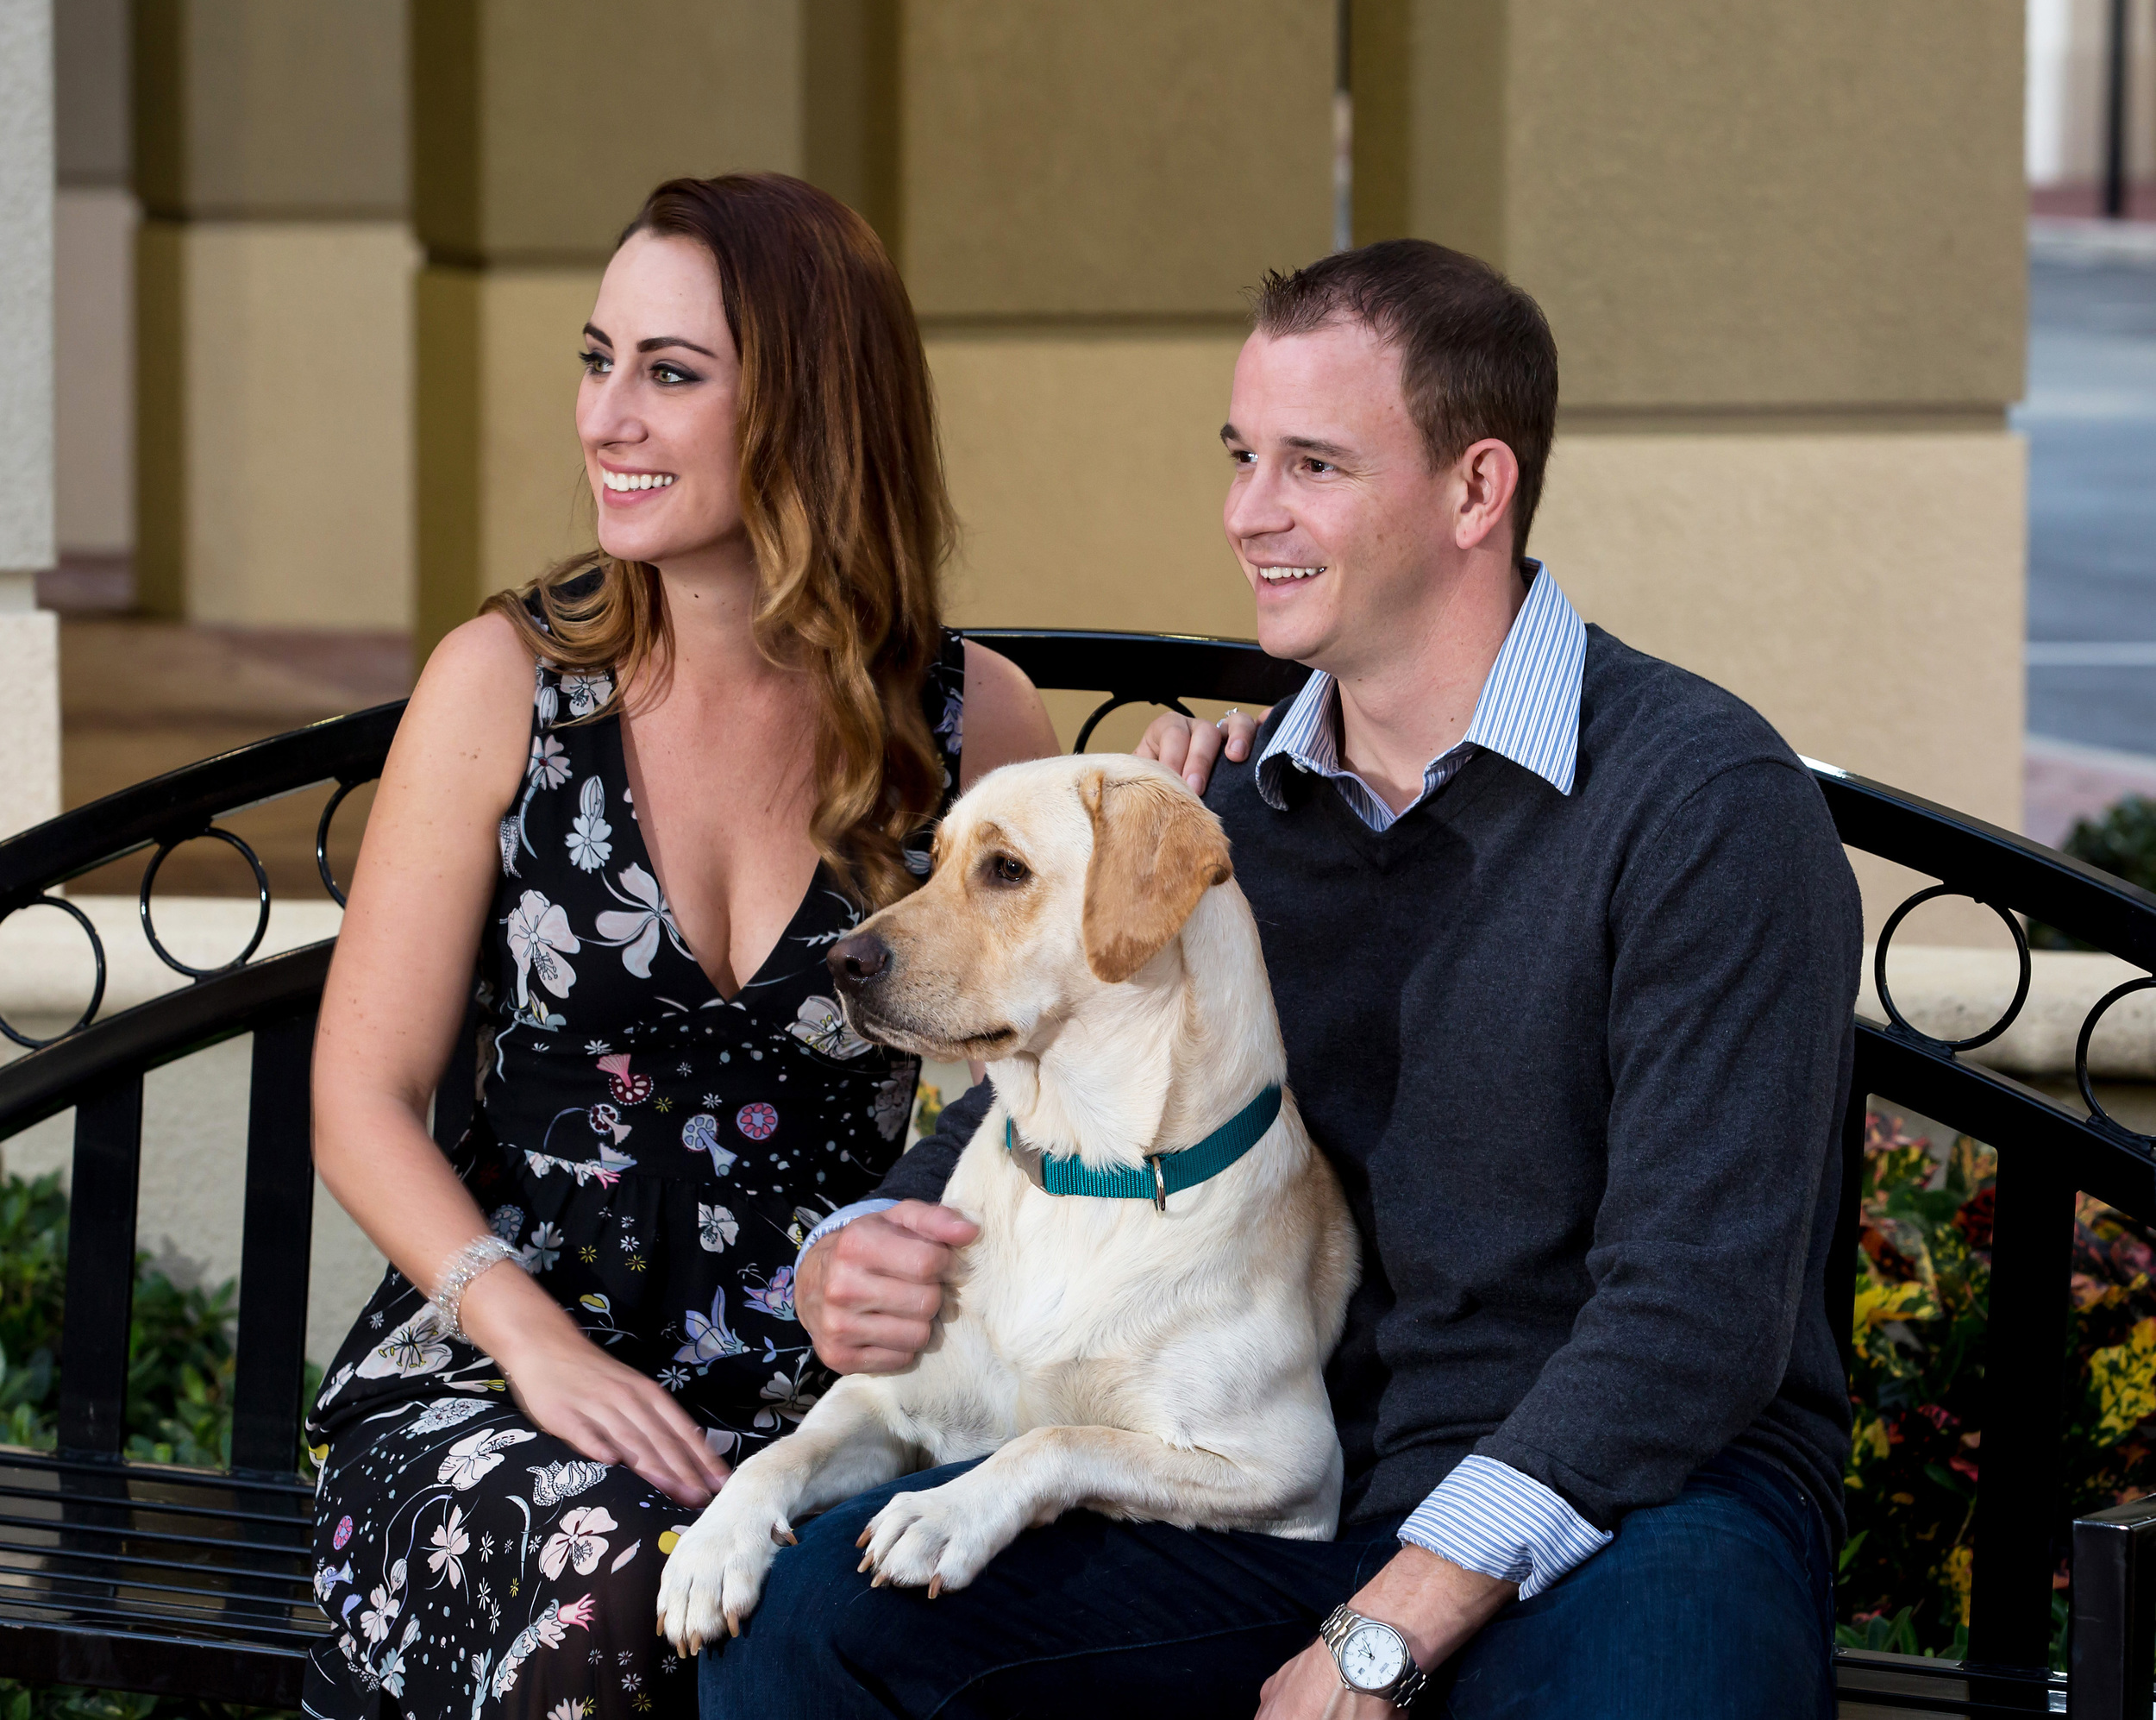 Family 2 (with Dog) QN9A2386.jpg